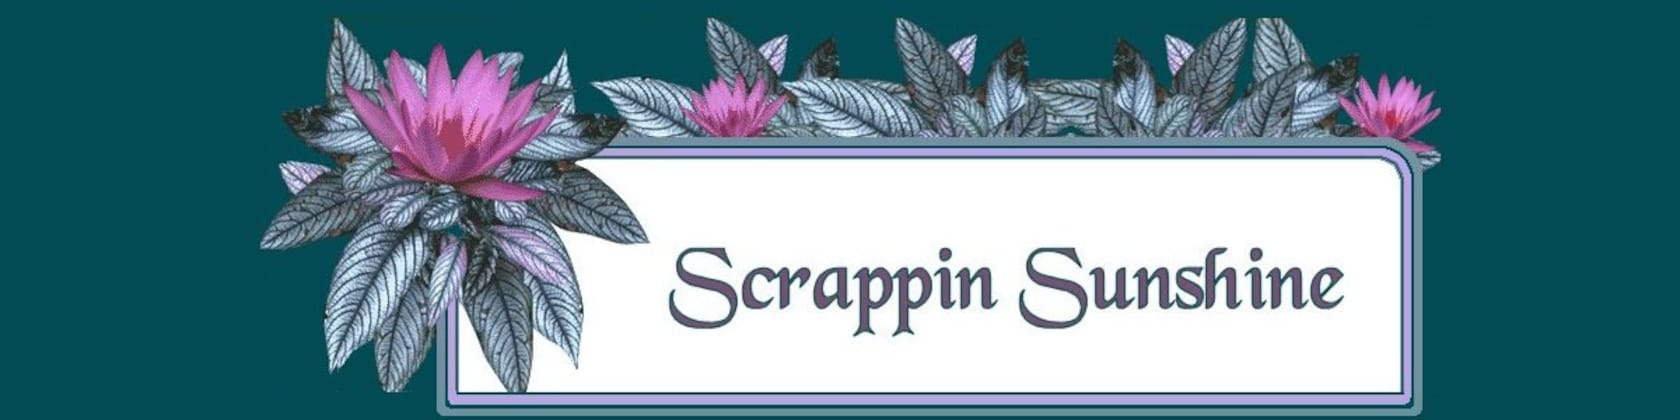 Scrappin Sunshine By Scrappinsunshine On Etsy